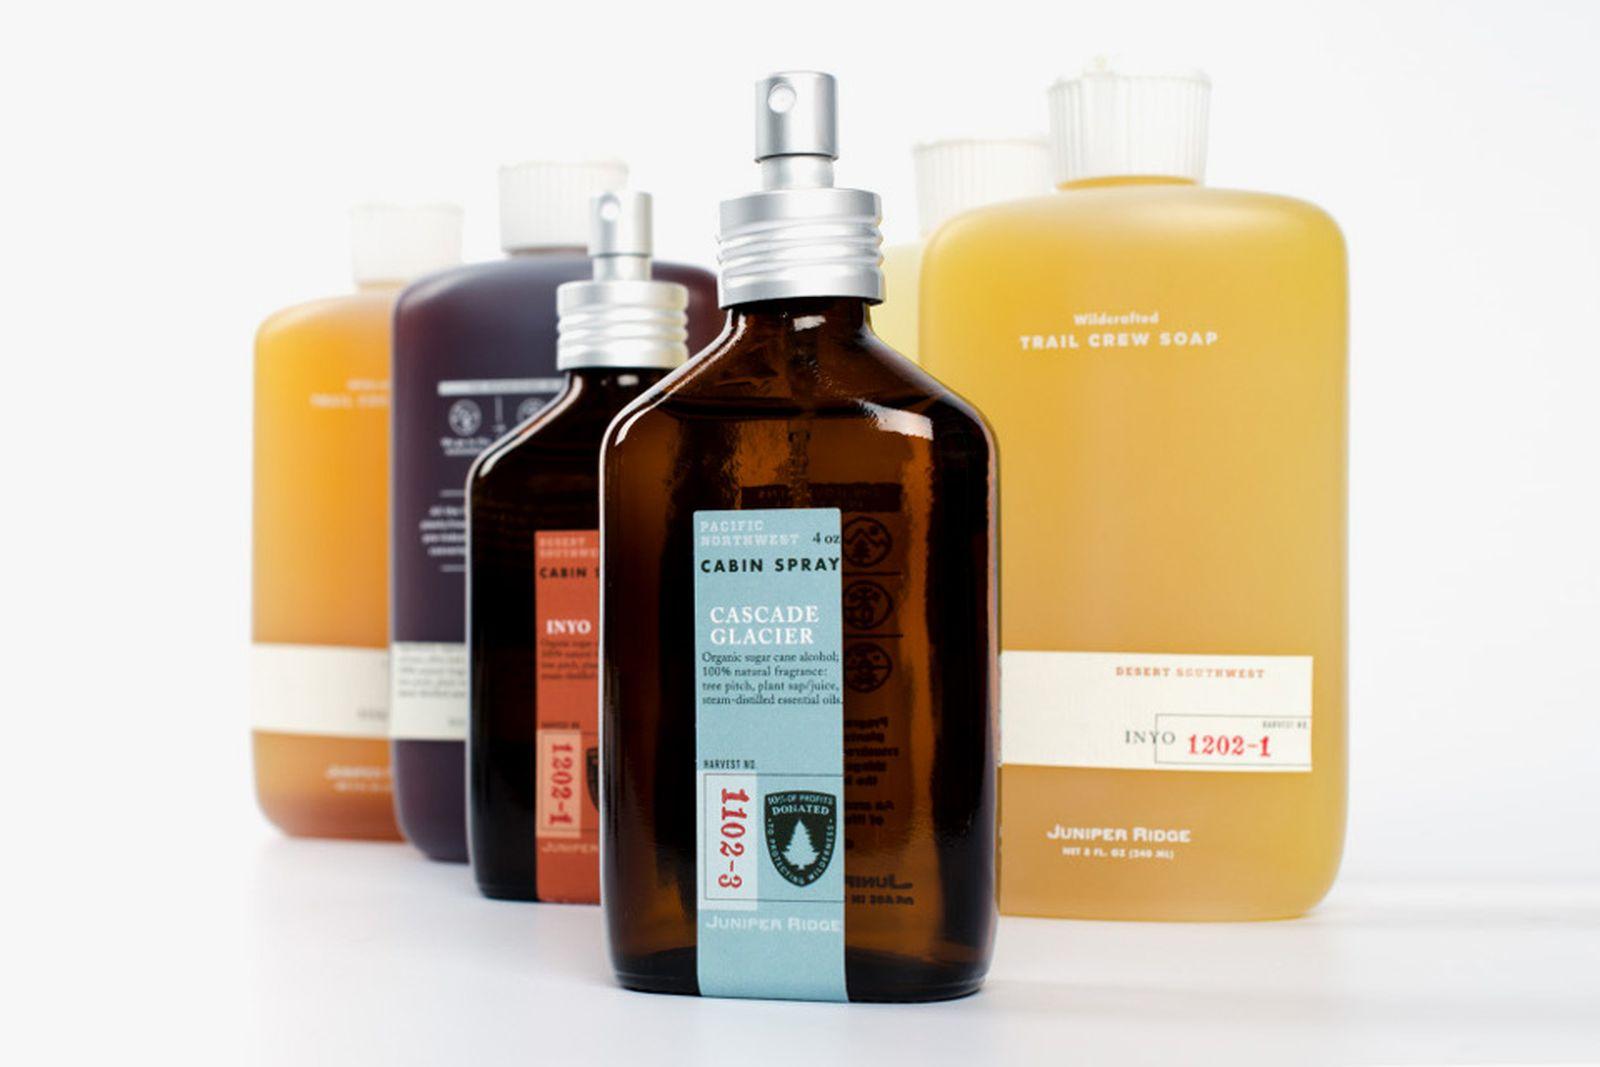 Perfume Brand Juniper Ridge